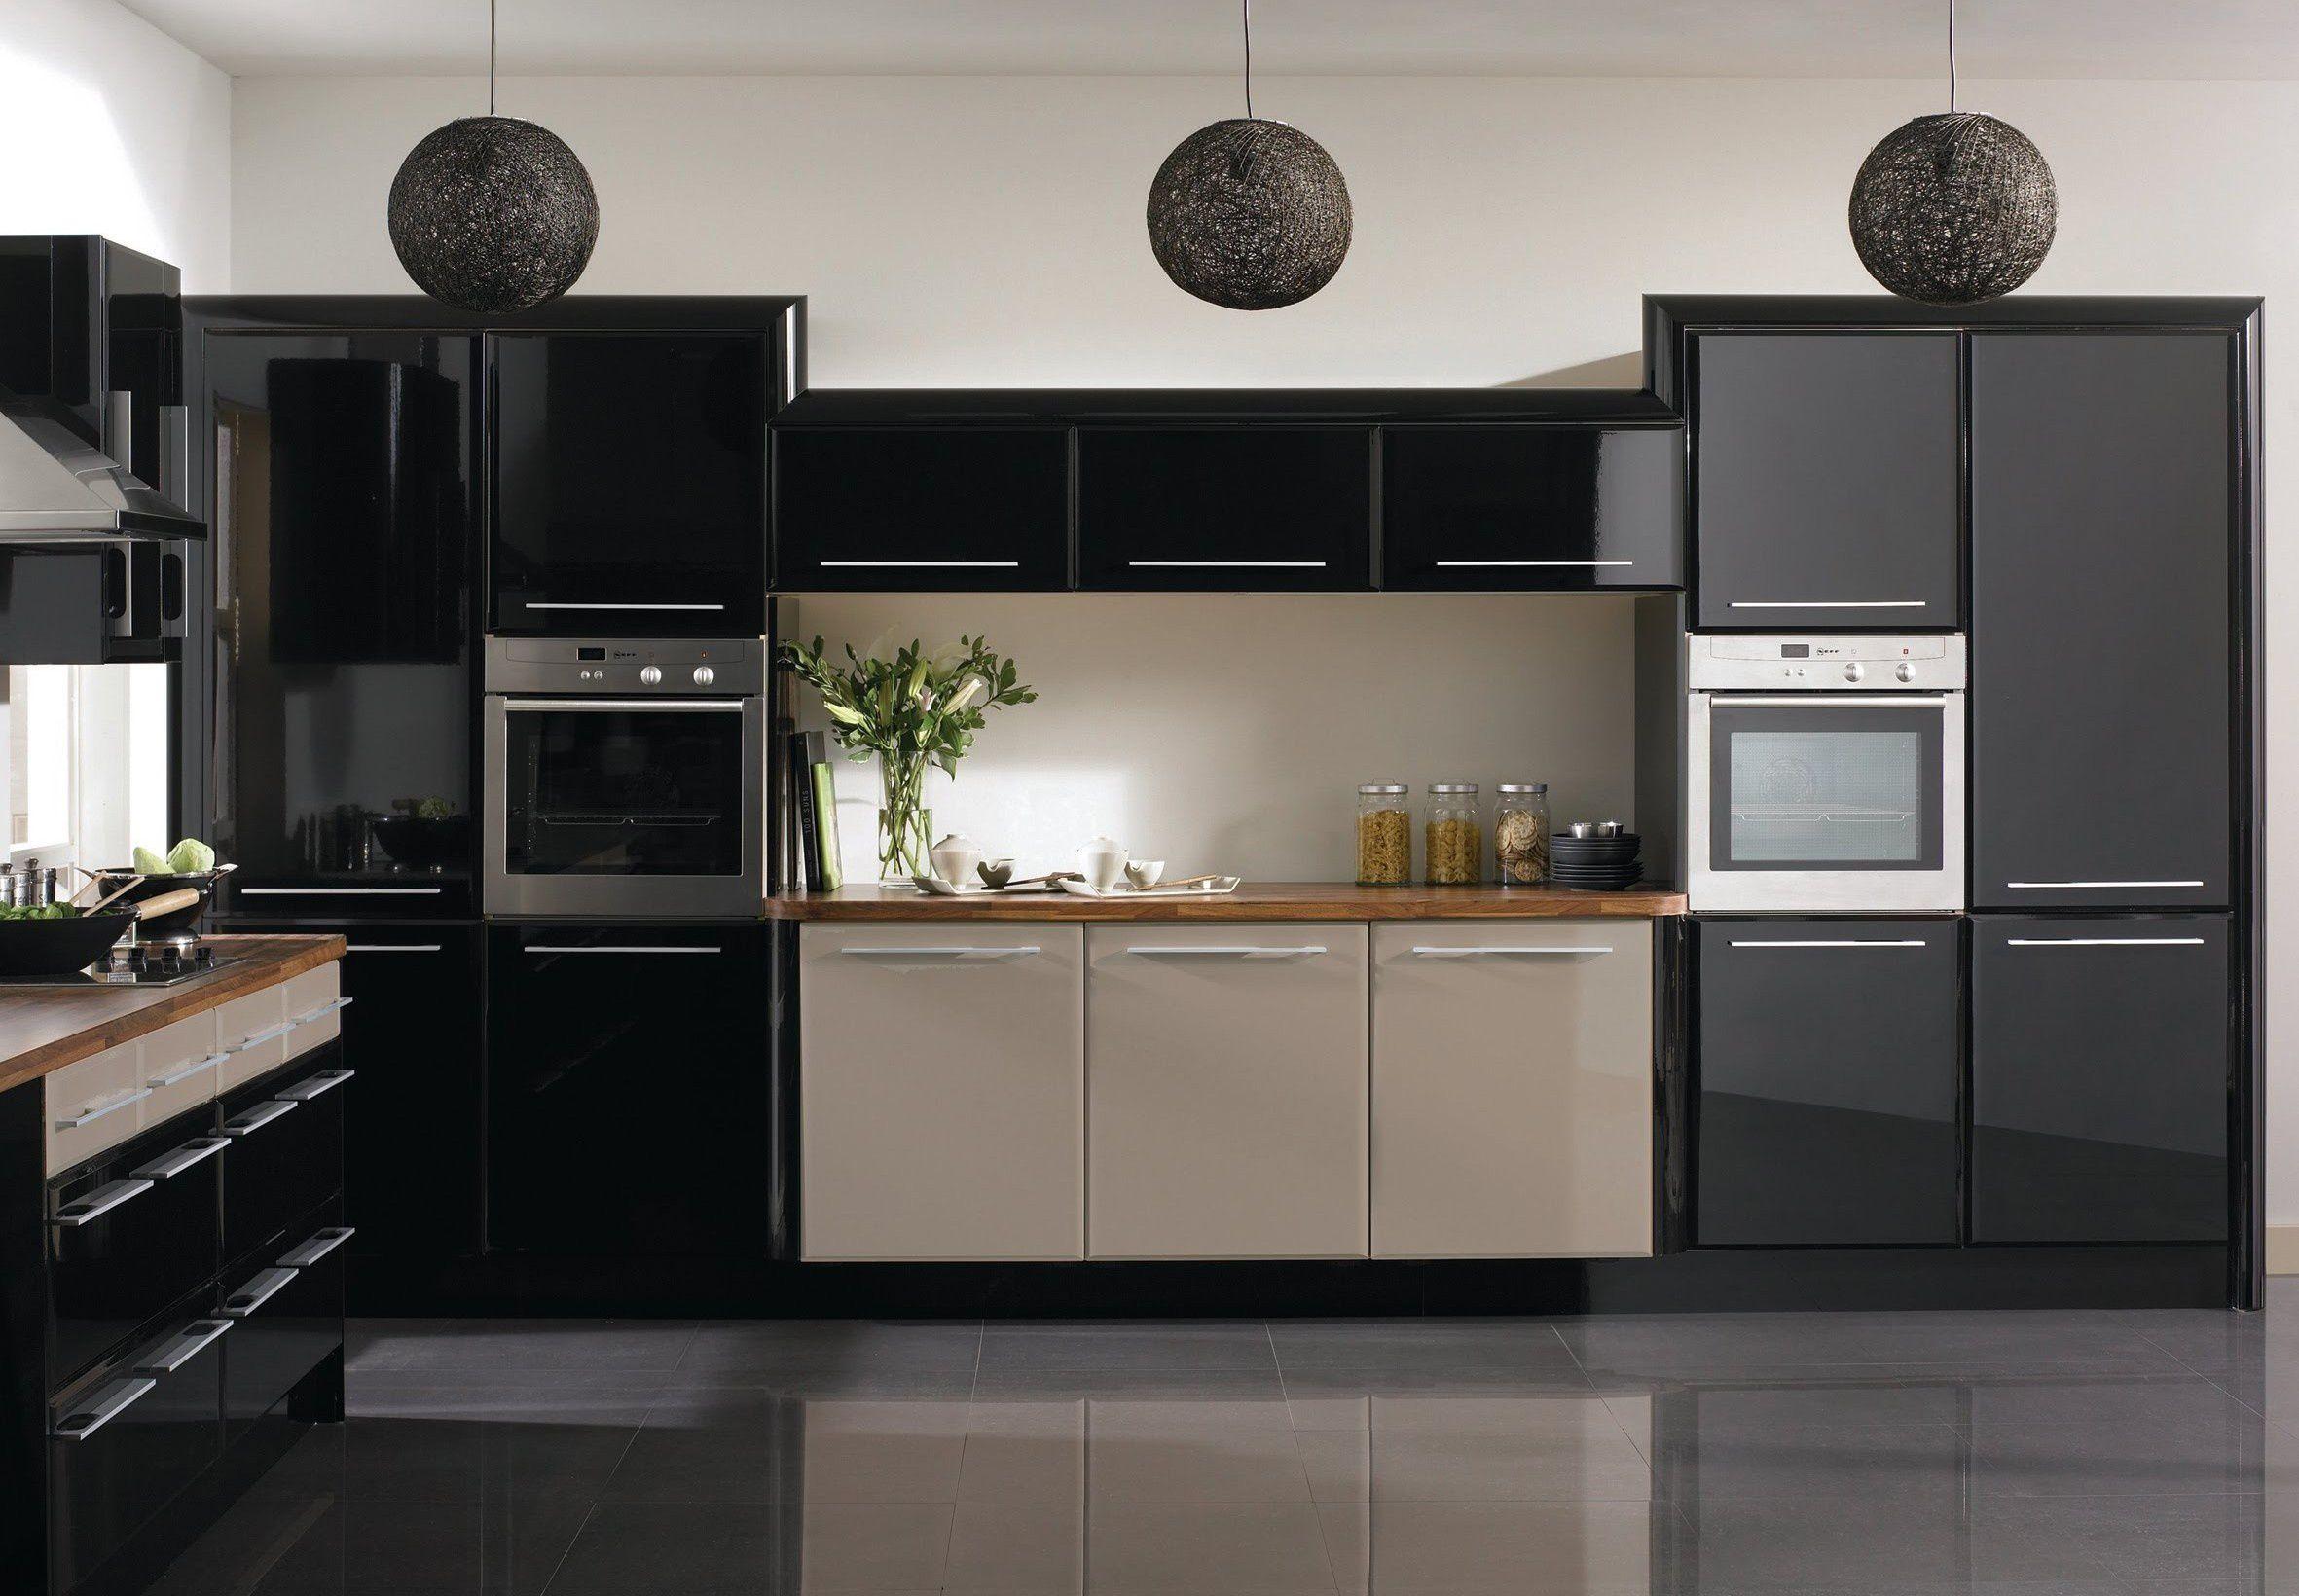 Black Gloss Kitchen Home Decor Kitchen Contemporary Kitchen Cabinets Interior Design Kitchen